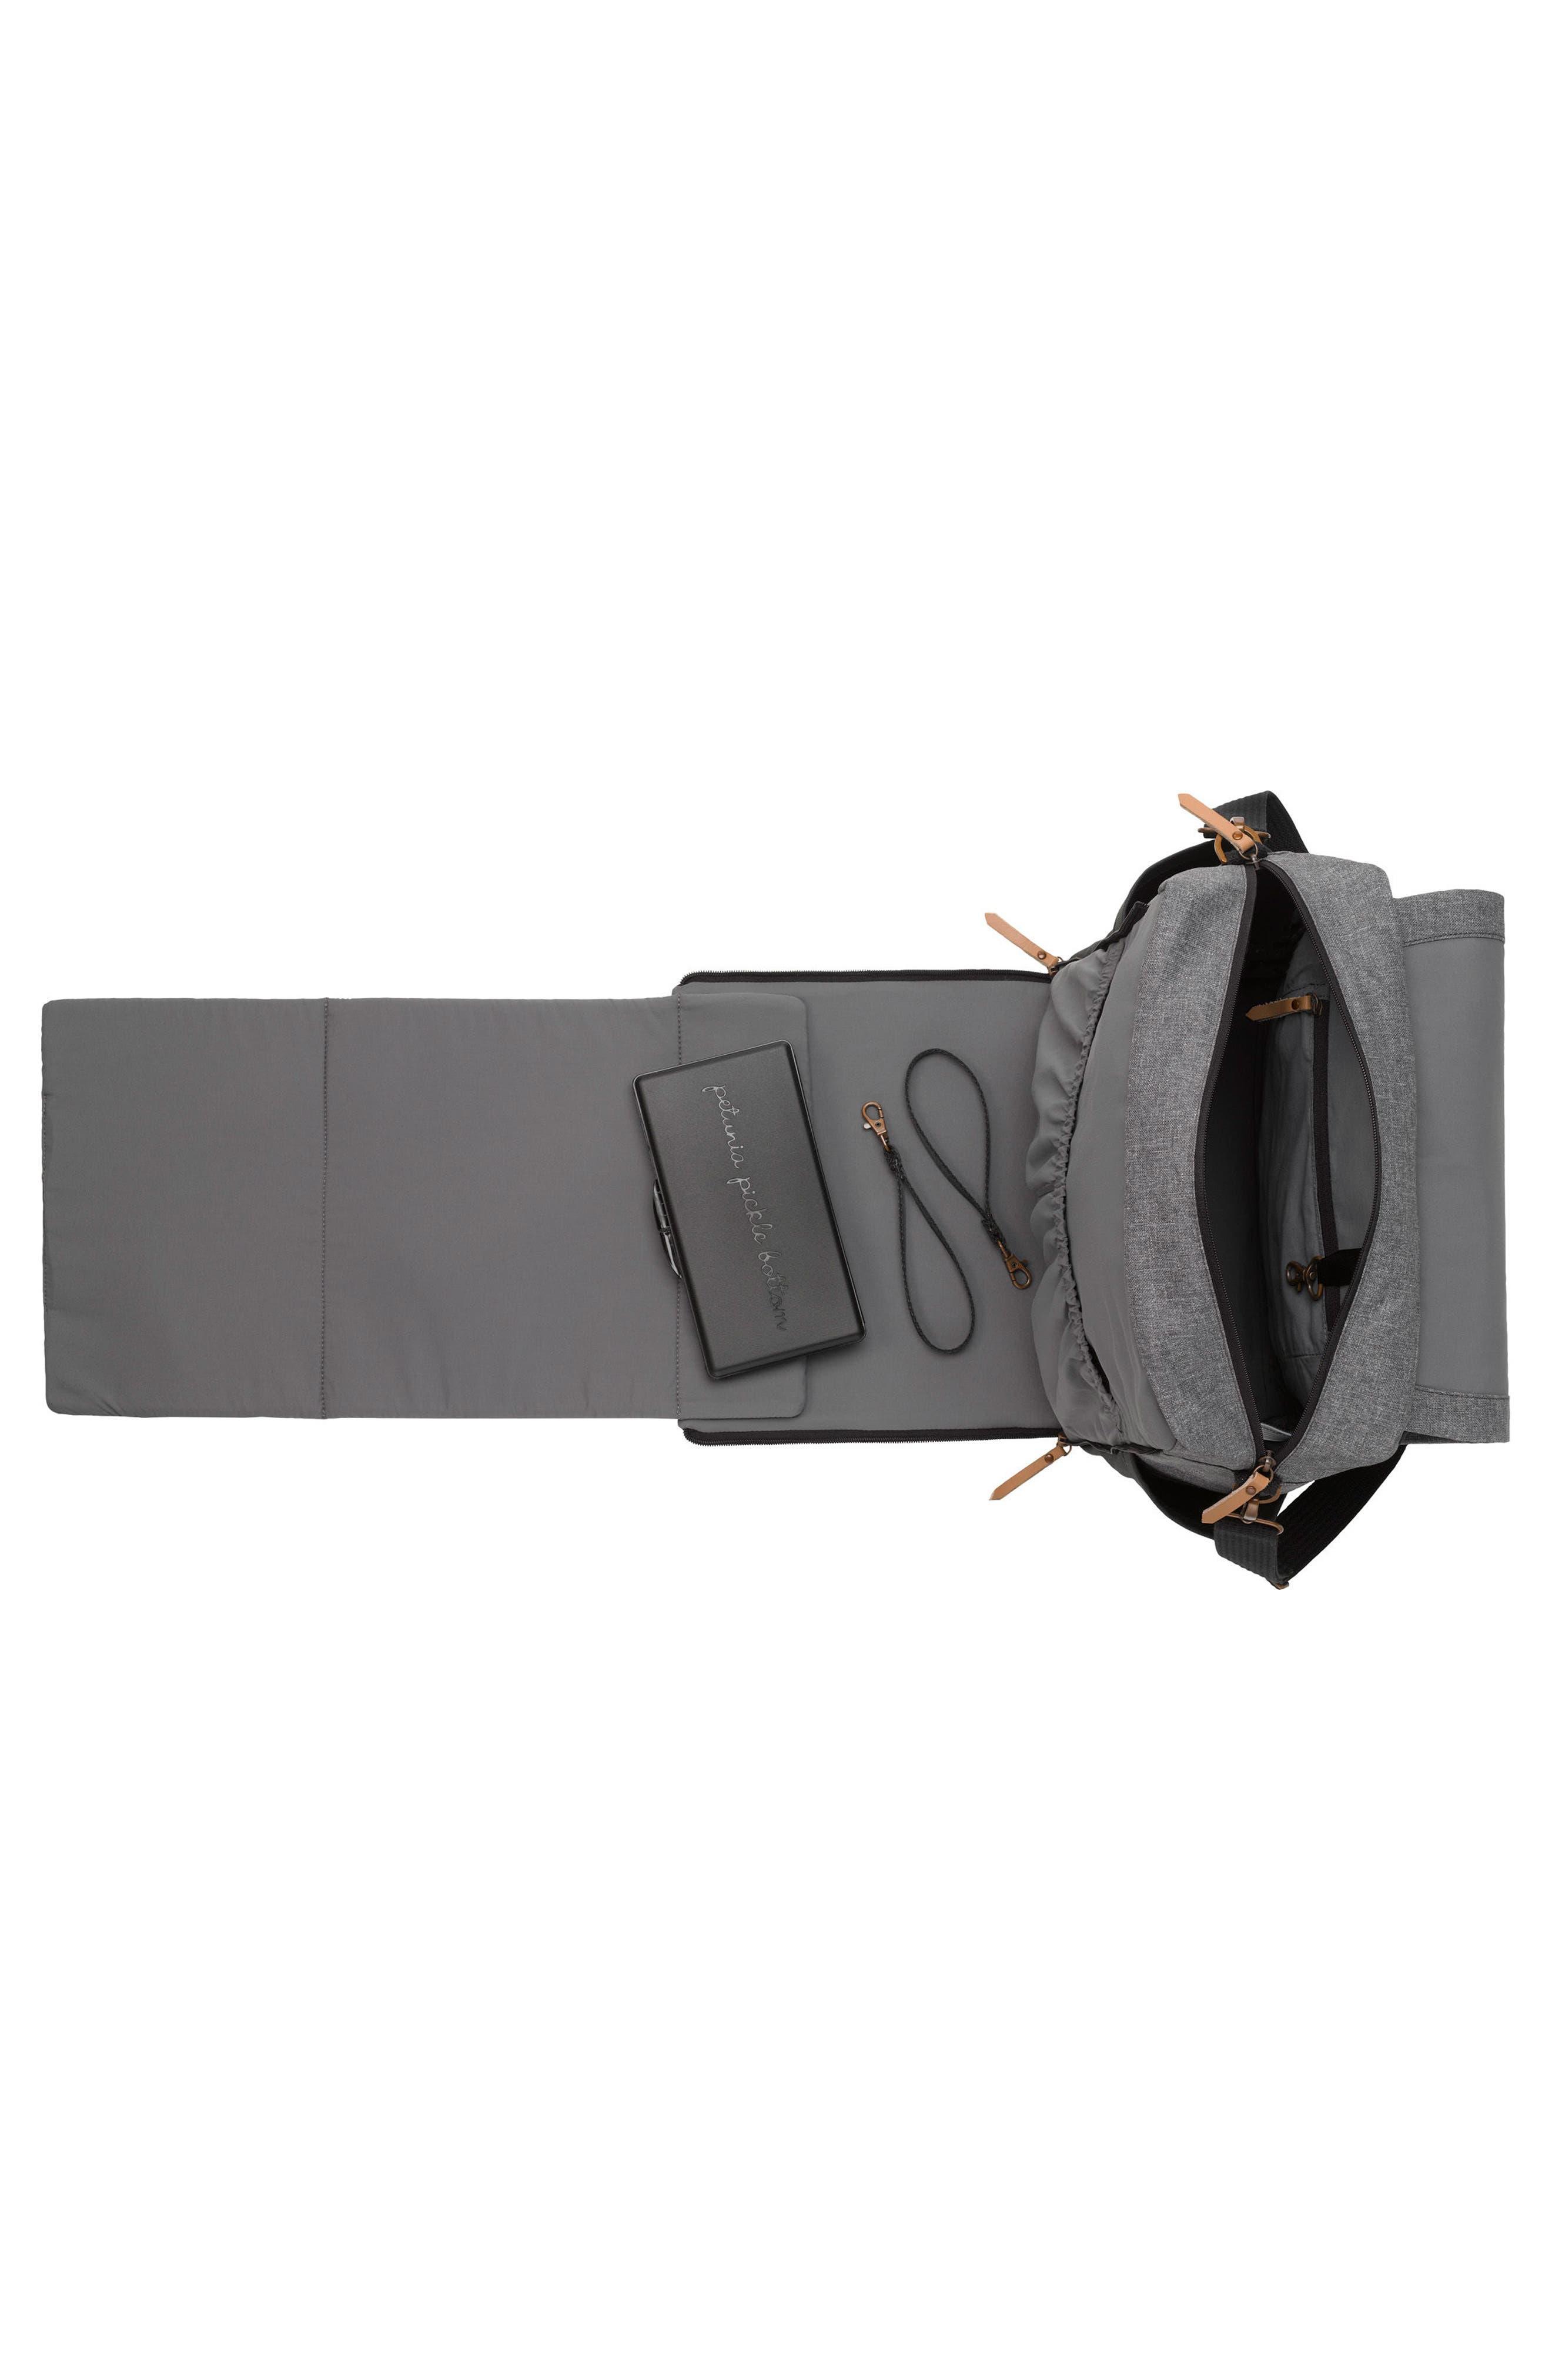 Boxy Backpack Diaper Bag,                             Alternate thumbnail 3, color,                             GRAPHITE/ BLACK